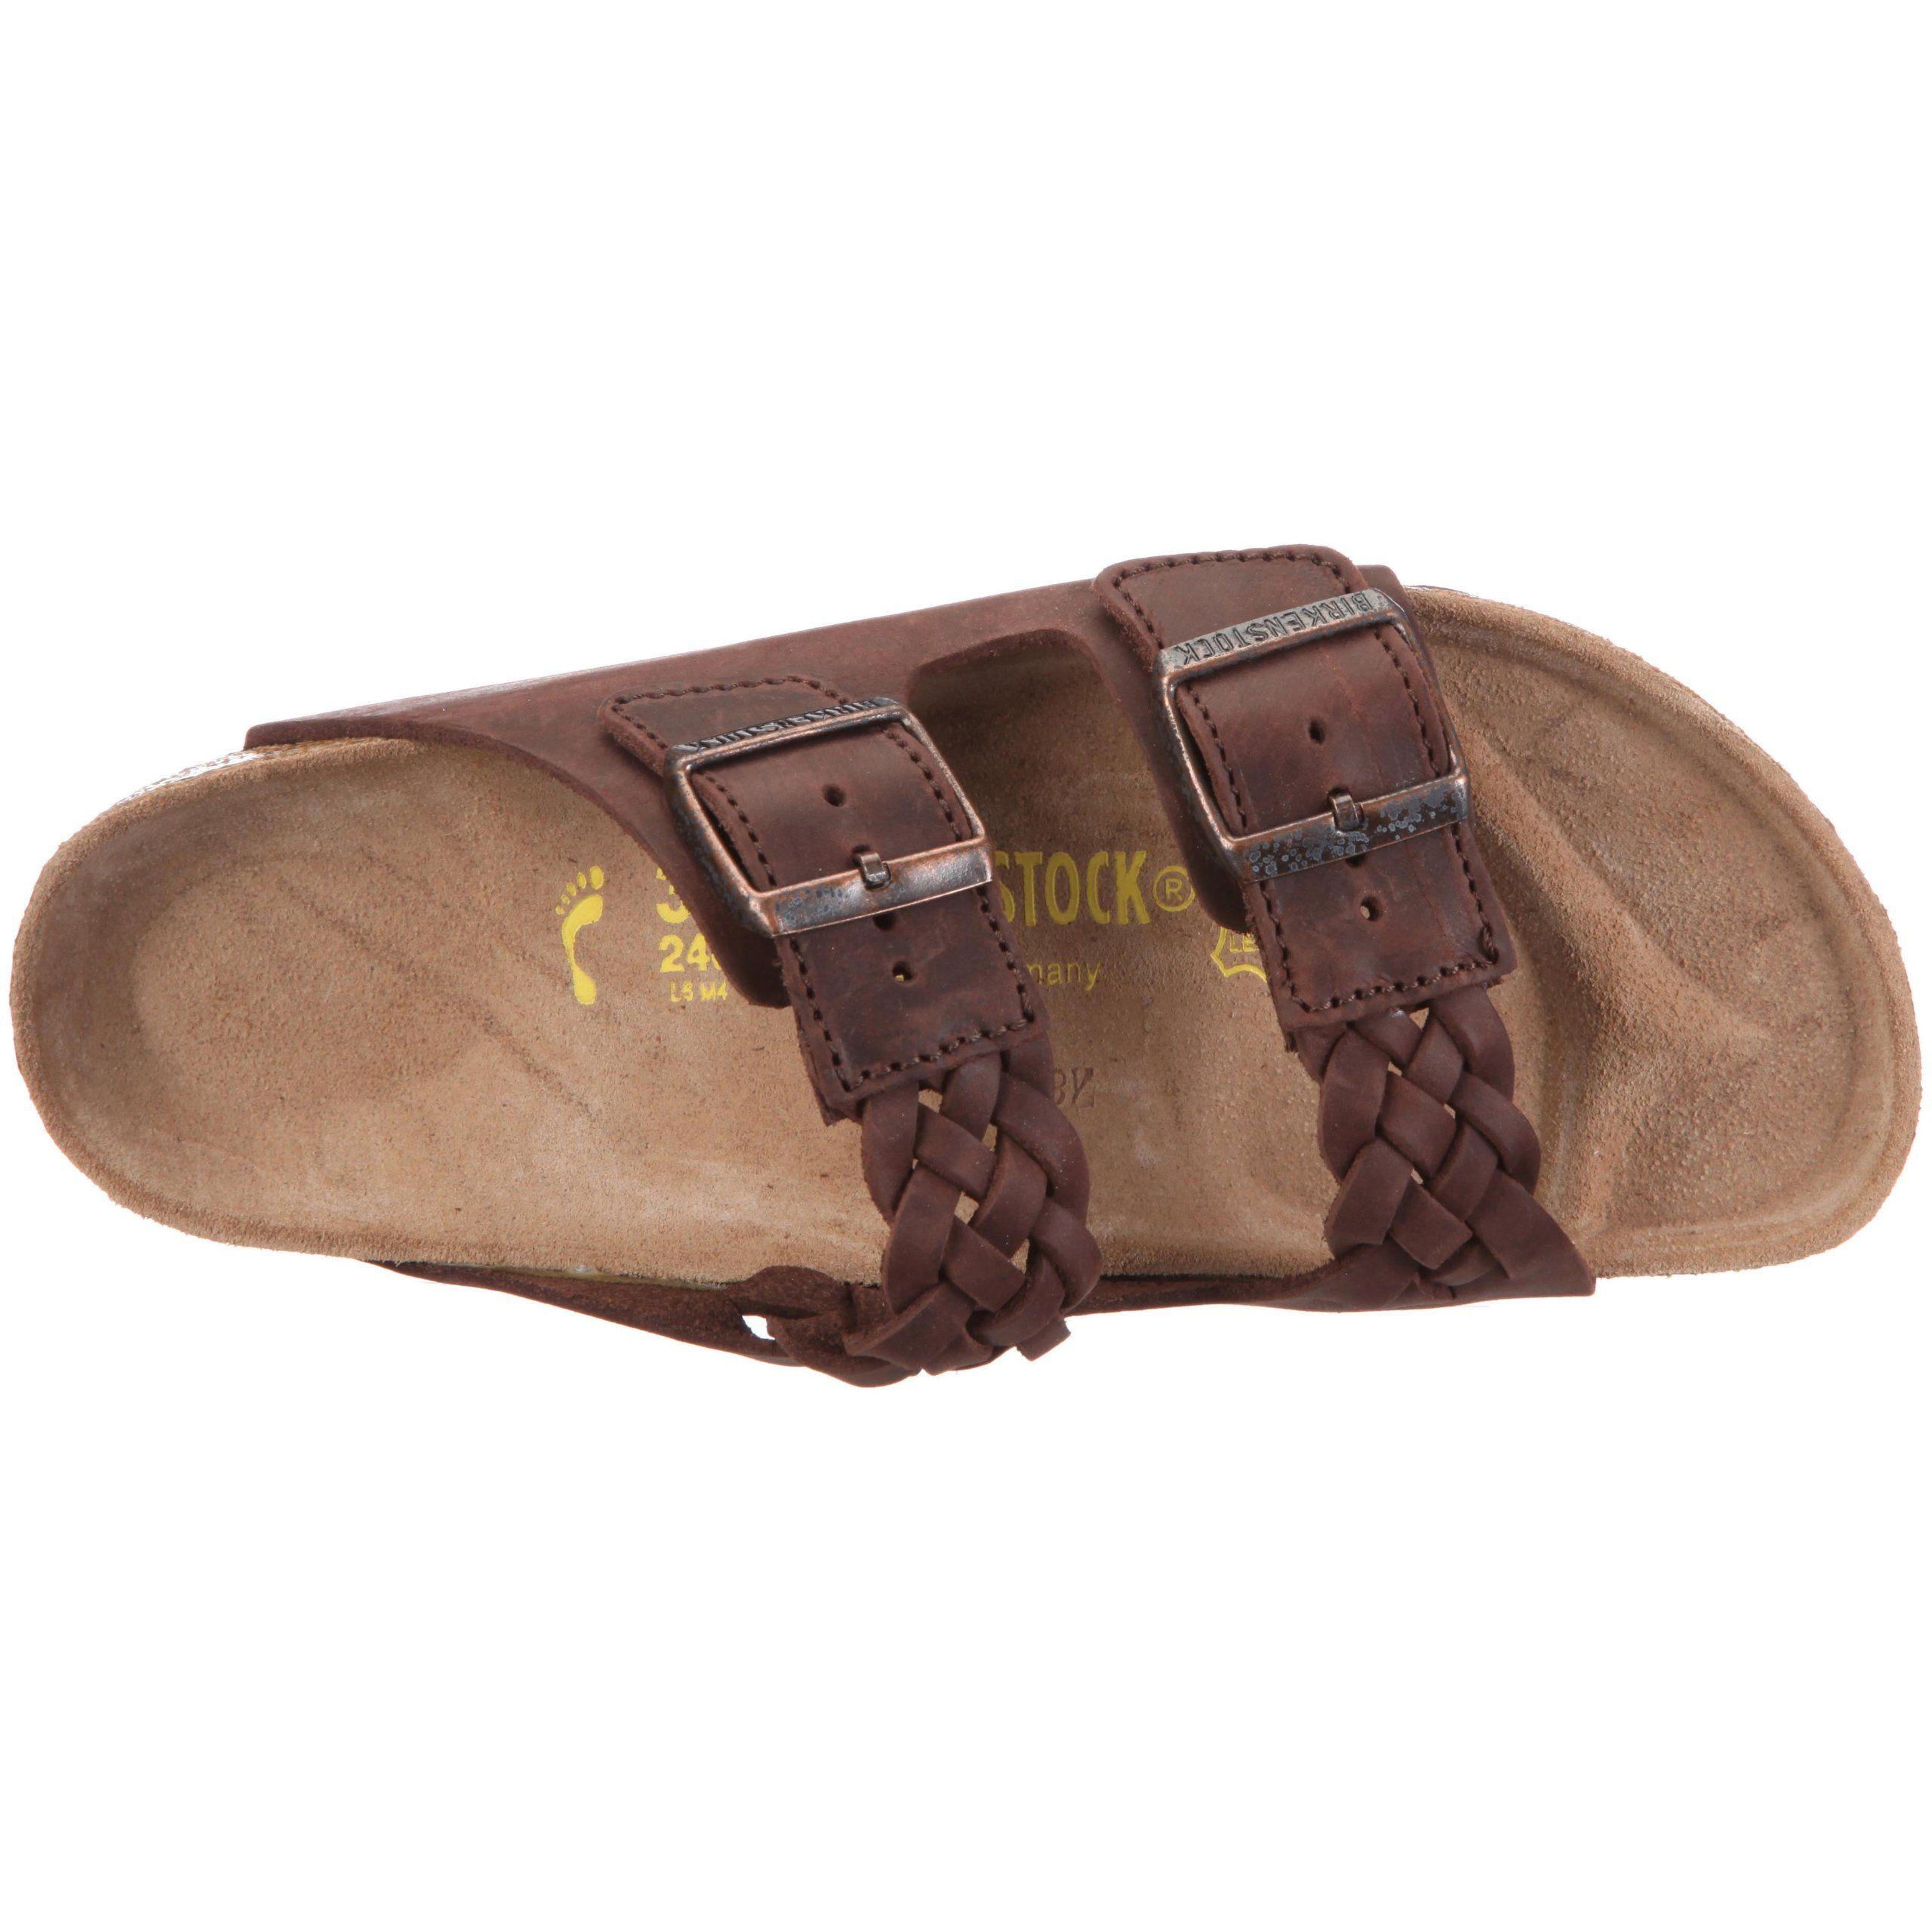 Tatami Zulia Waxy Leather Braided Tobacco Brown